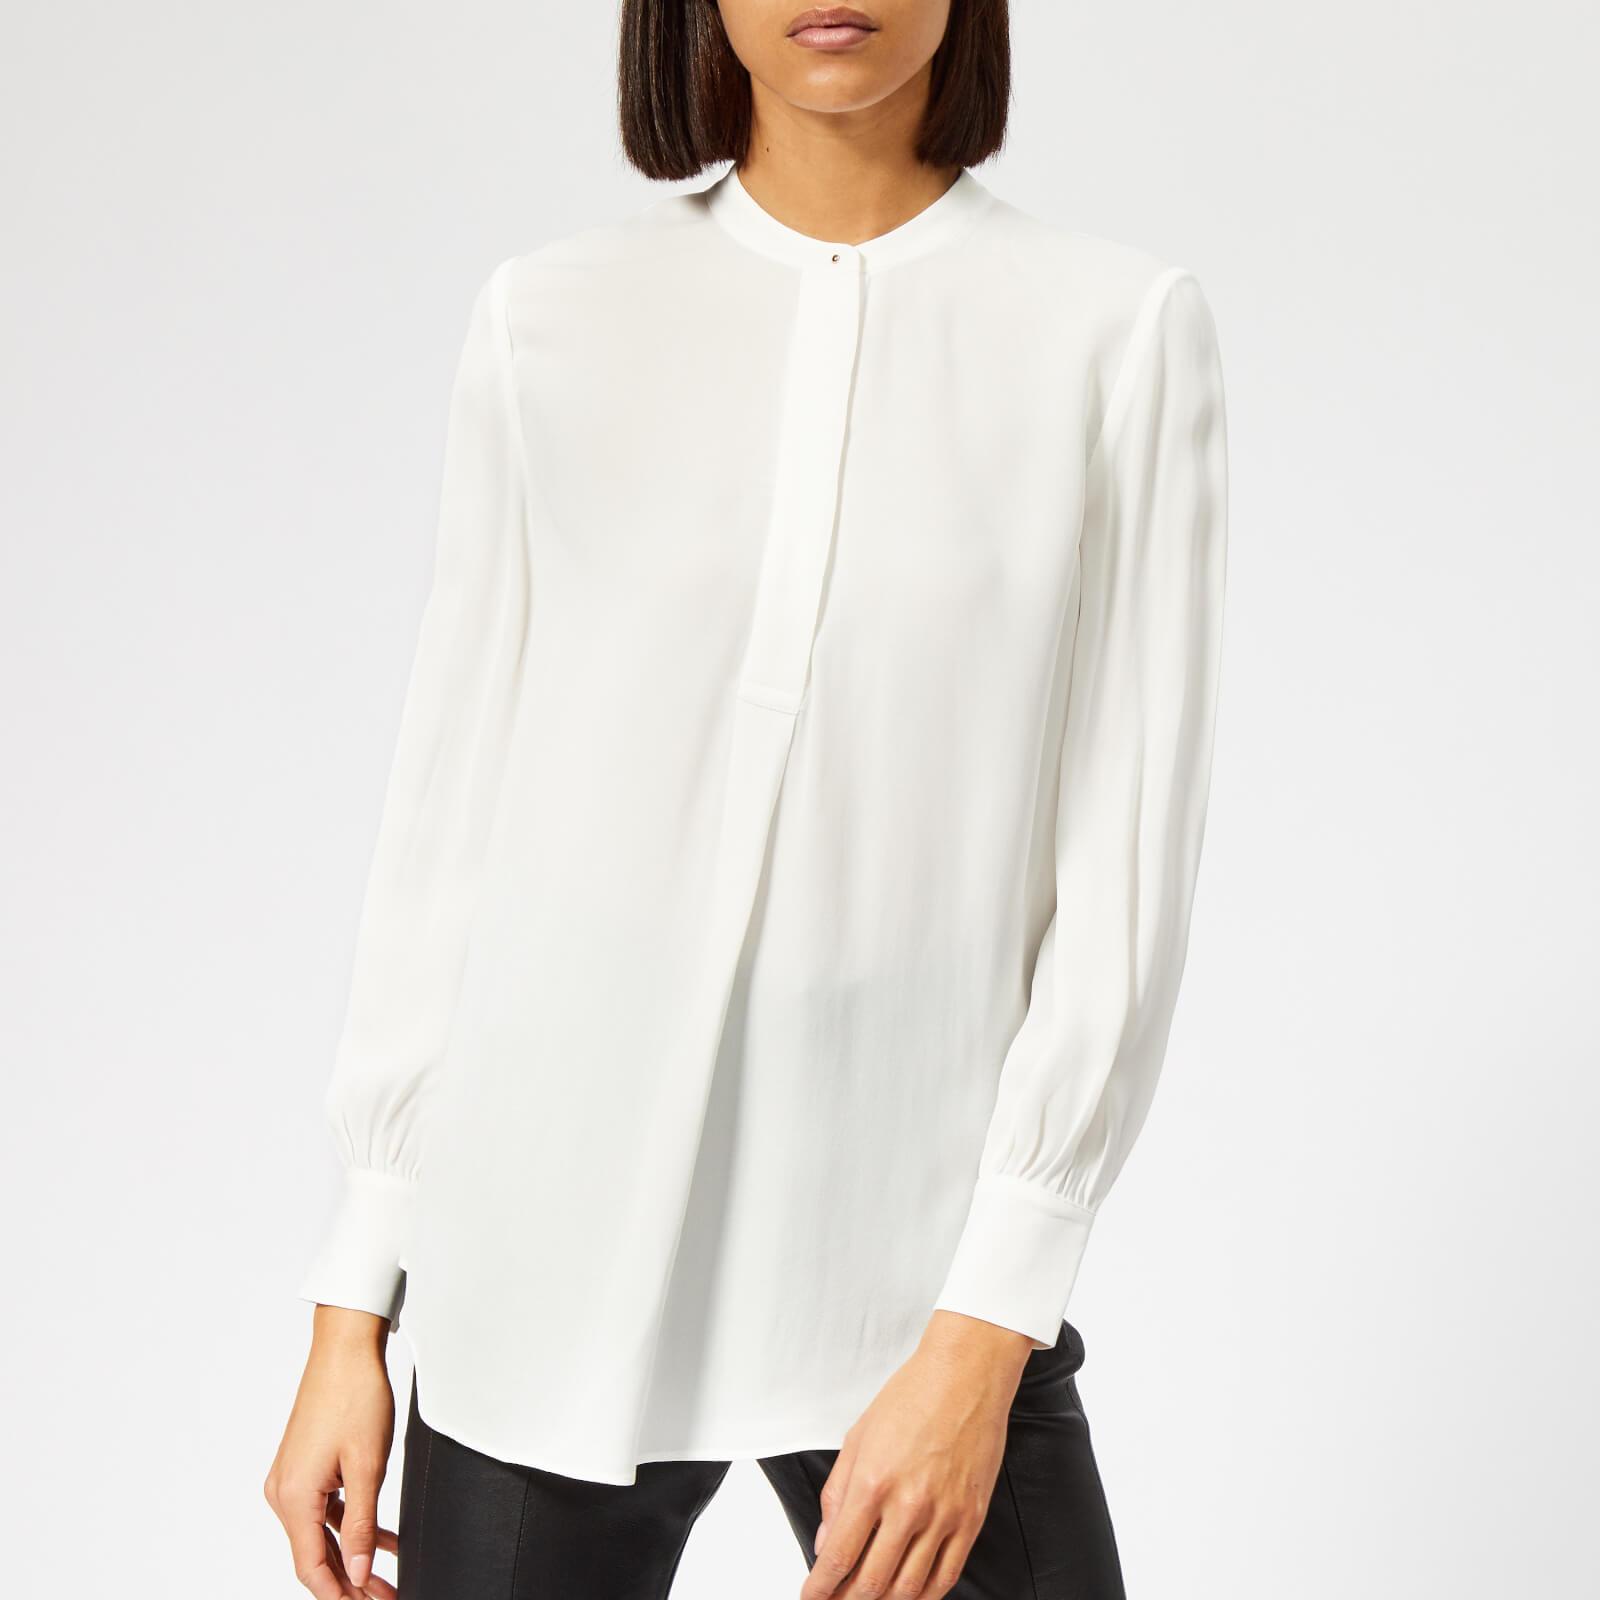 Whistles Women's Stud Pleat Blouse - Ivory - UK 8 - Cream